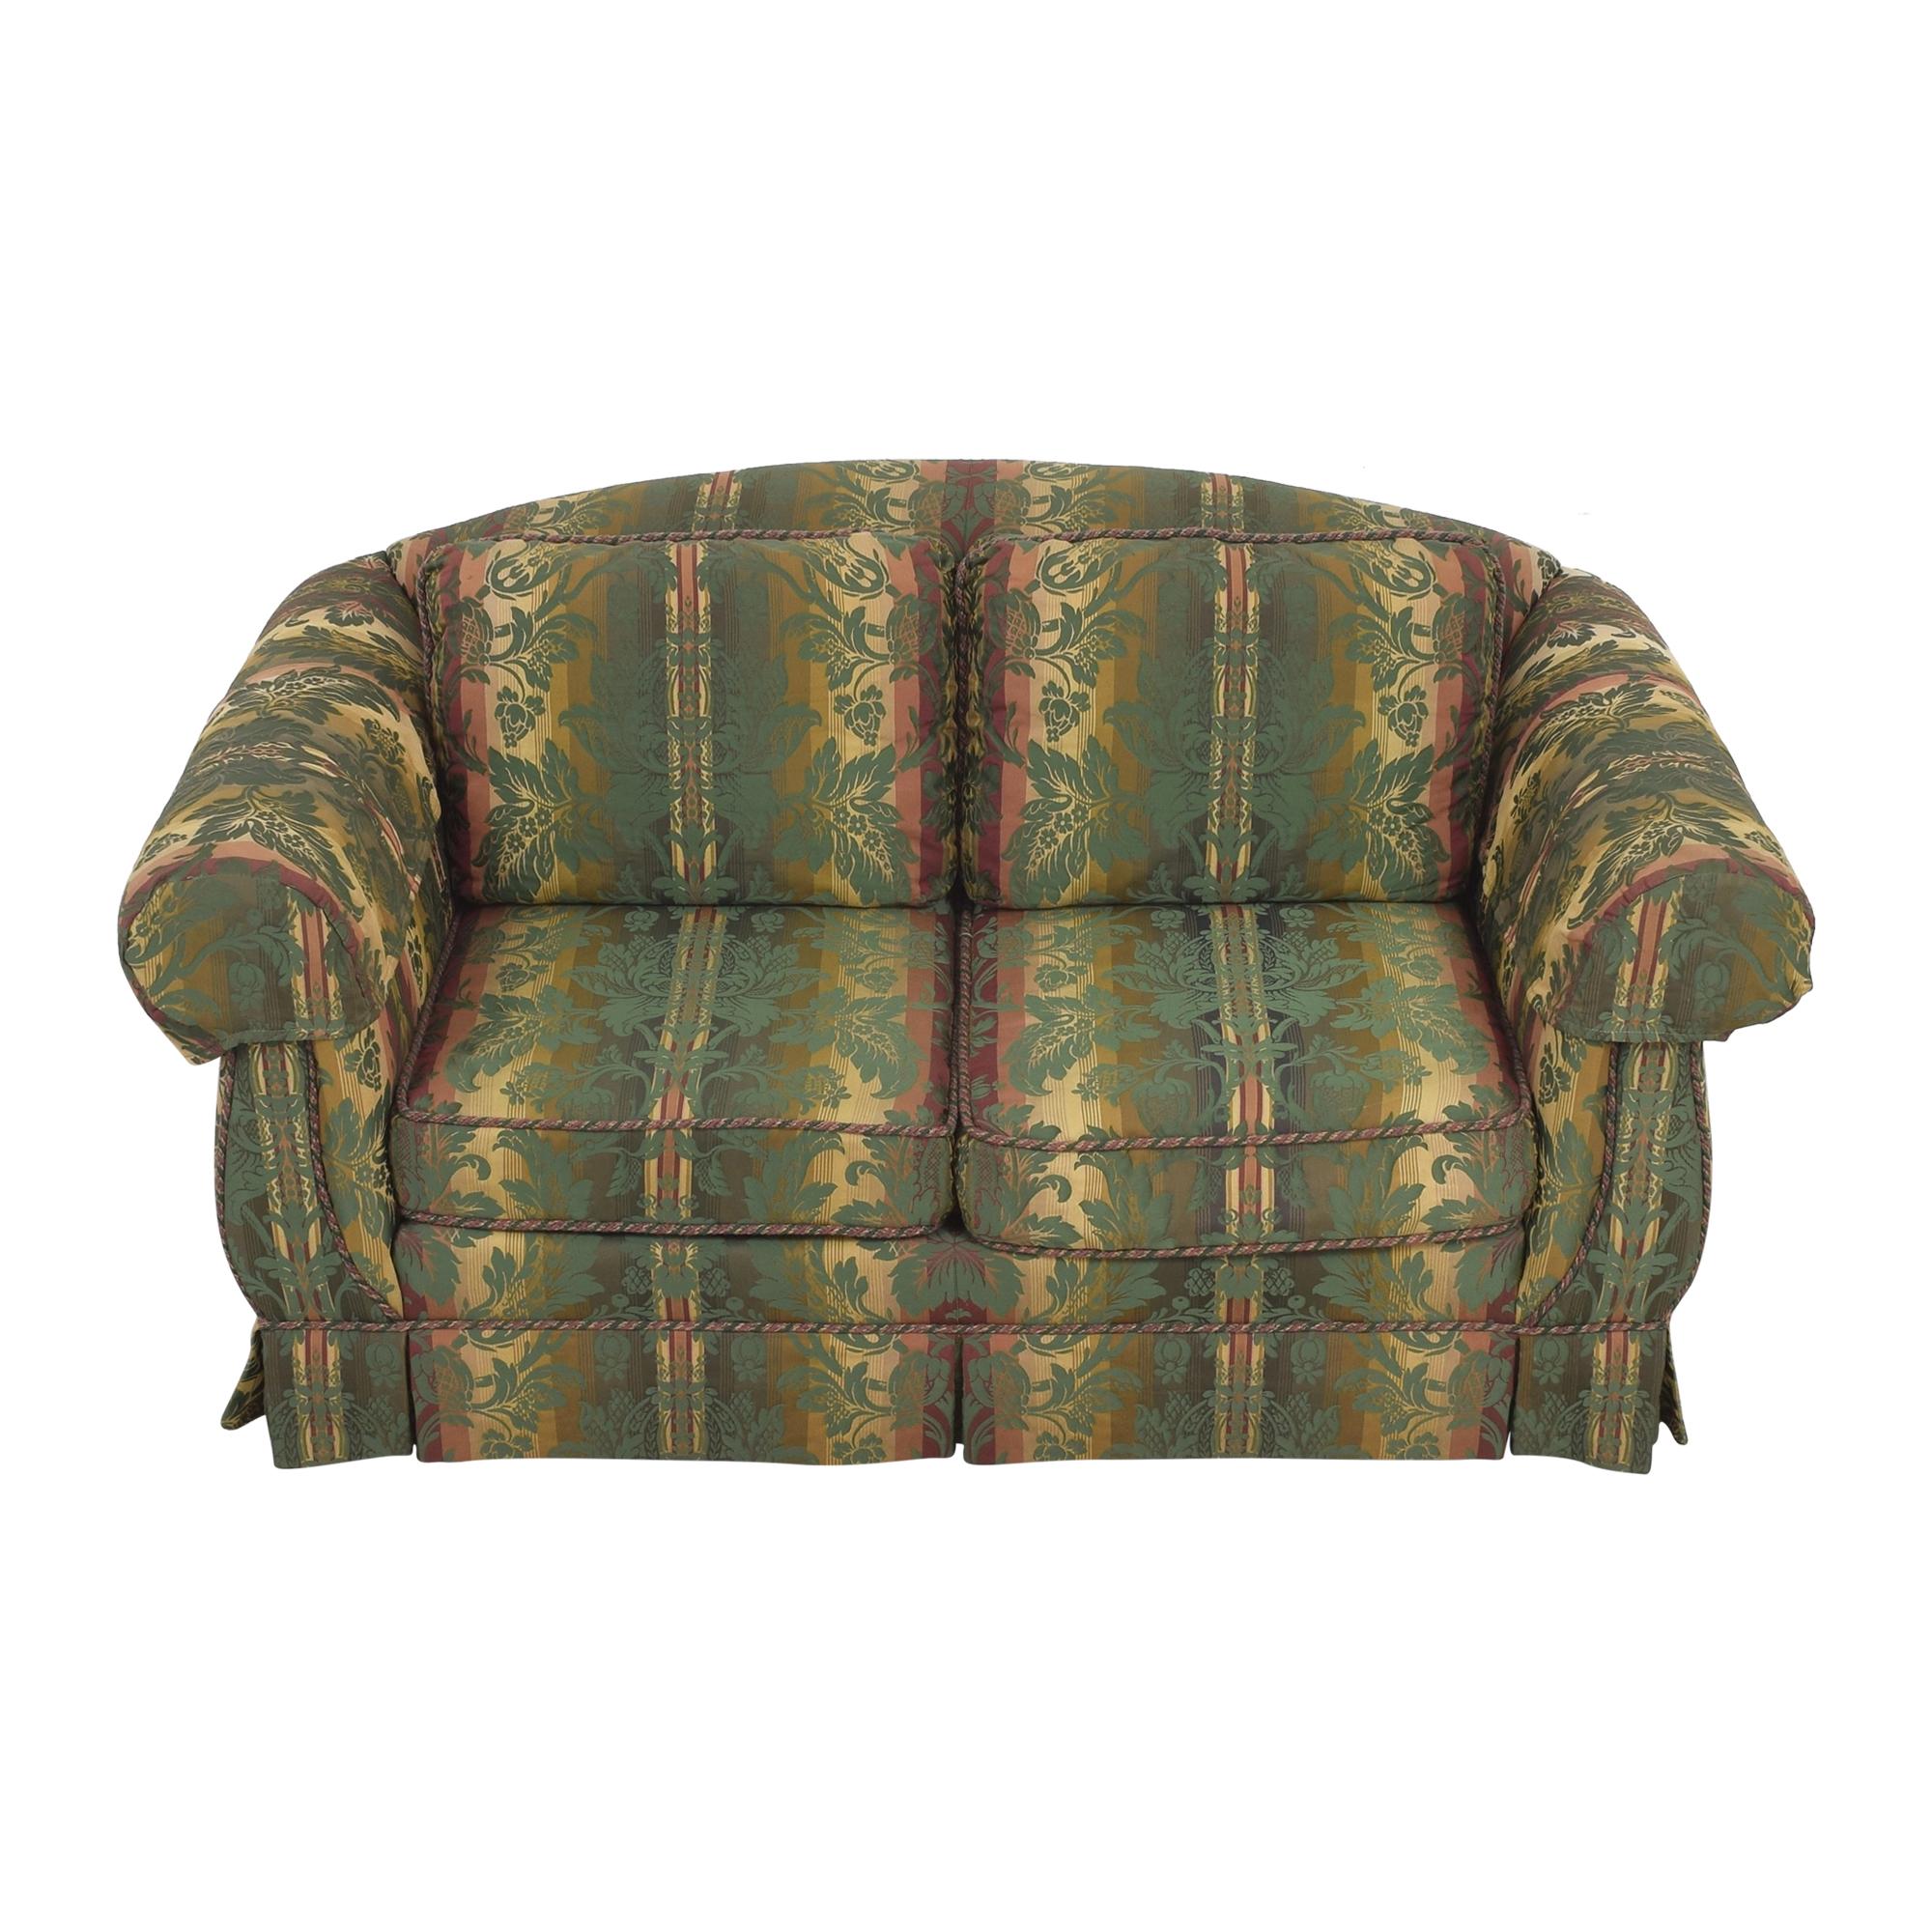 Thomasville Thomasville Patterned Two Cushion Sofa